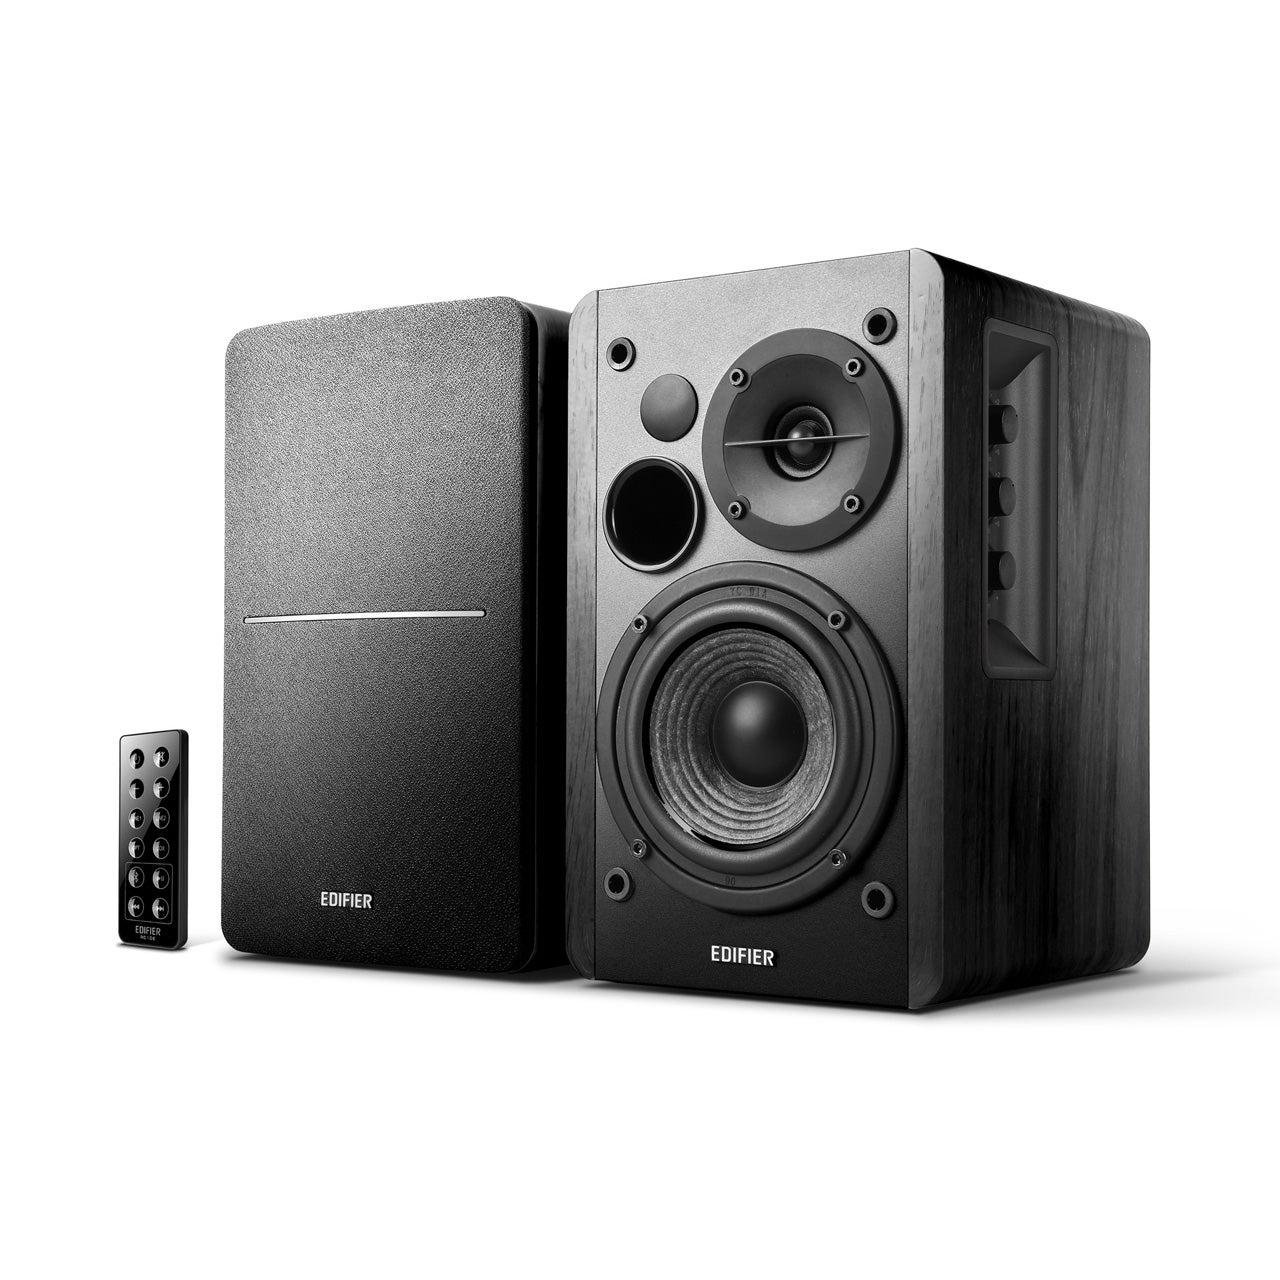 Edifier's R1280T Bluetooth speakers